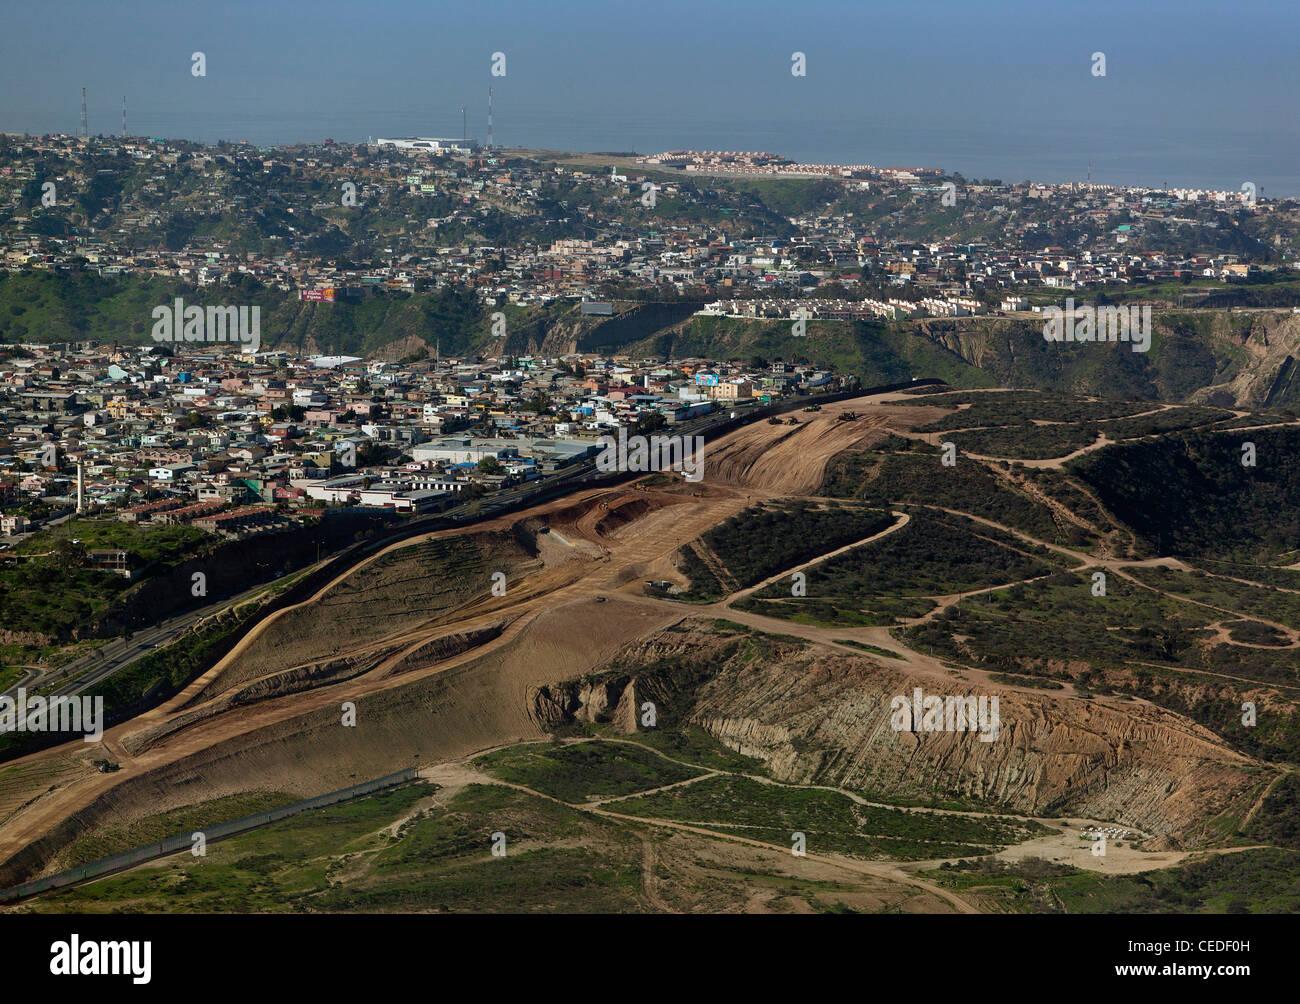 aerial photograph border fence Tijuana Mexico - Stock Image